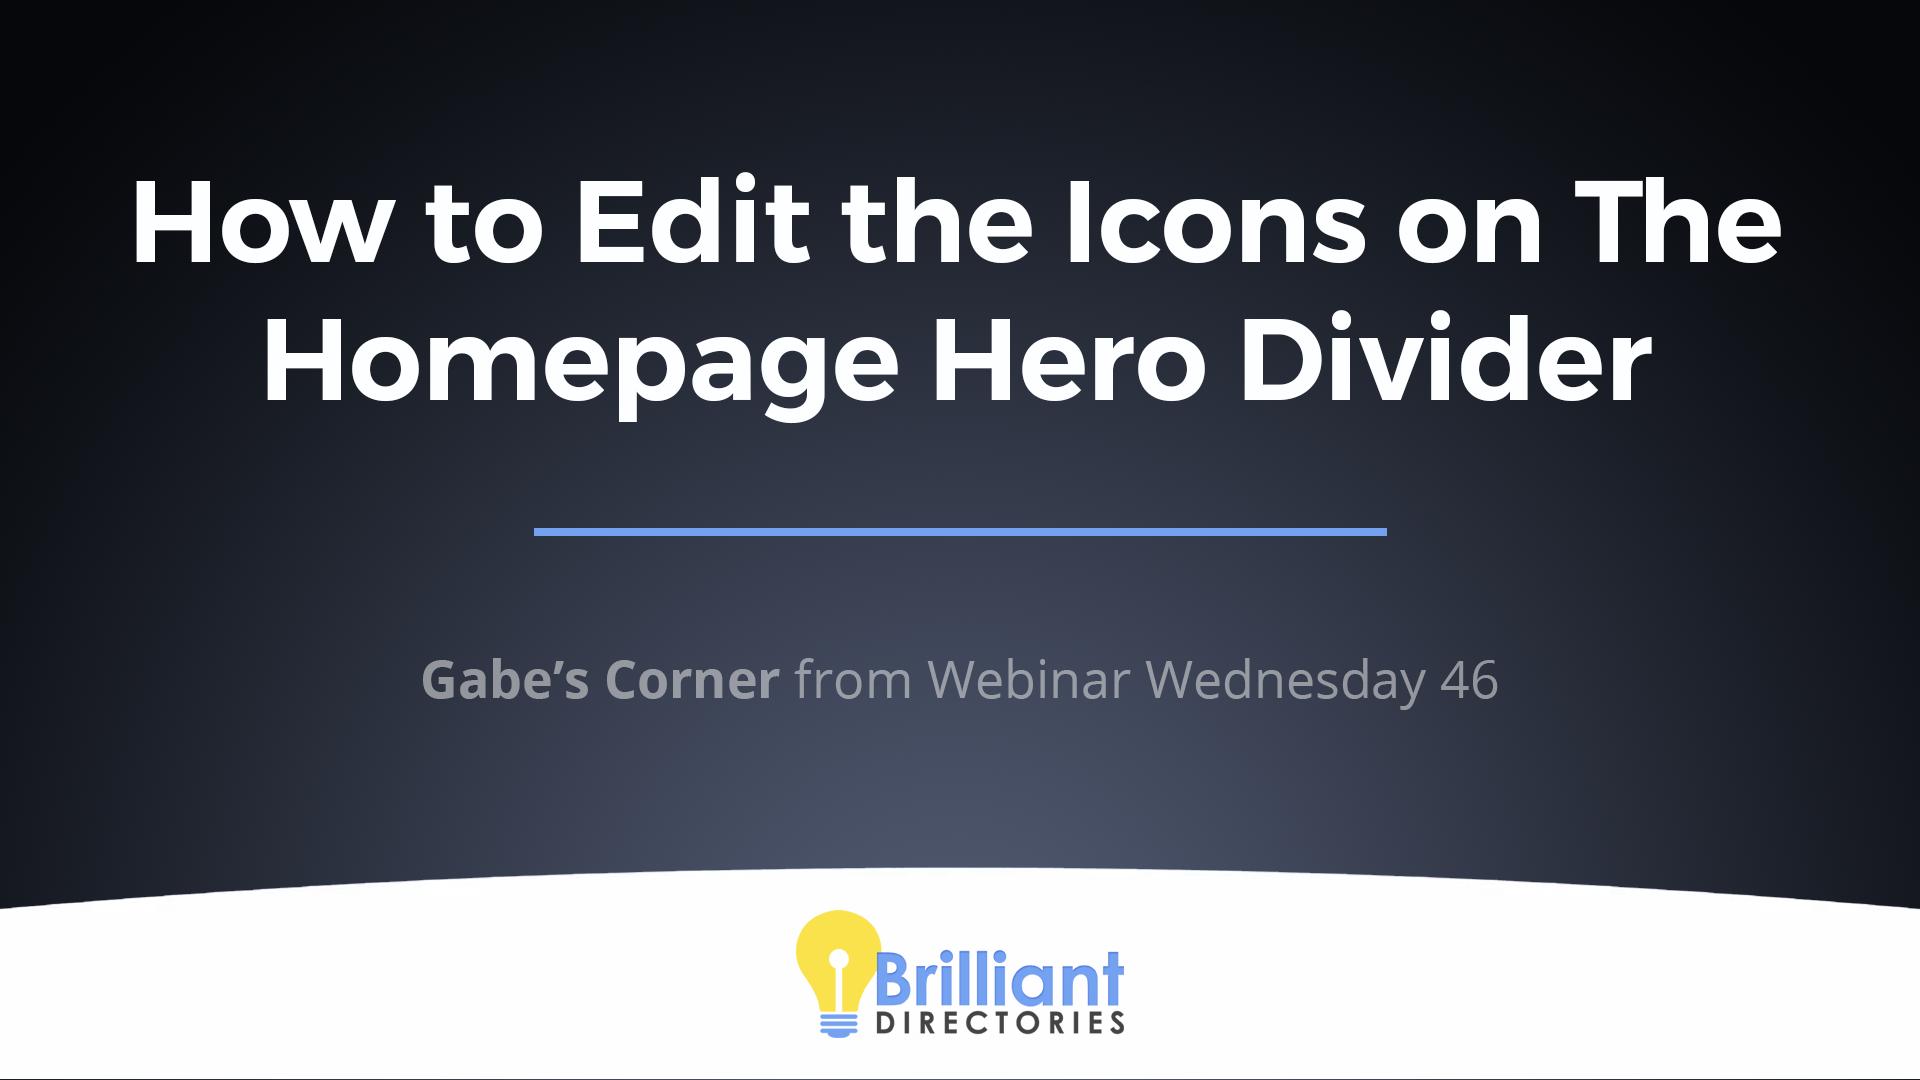 https://www.brilliantdirectories.com/blog/edit-homepage-hero-divider-icons-popular-how-tos